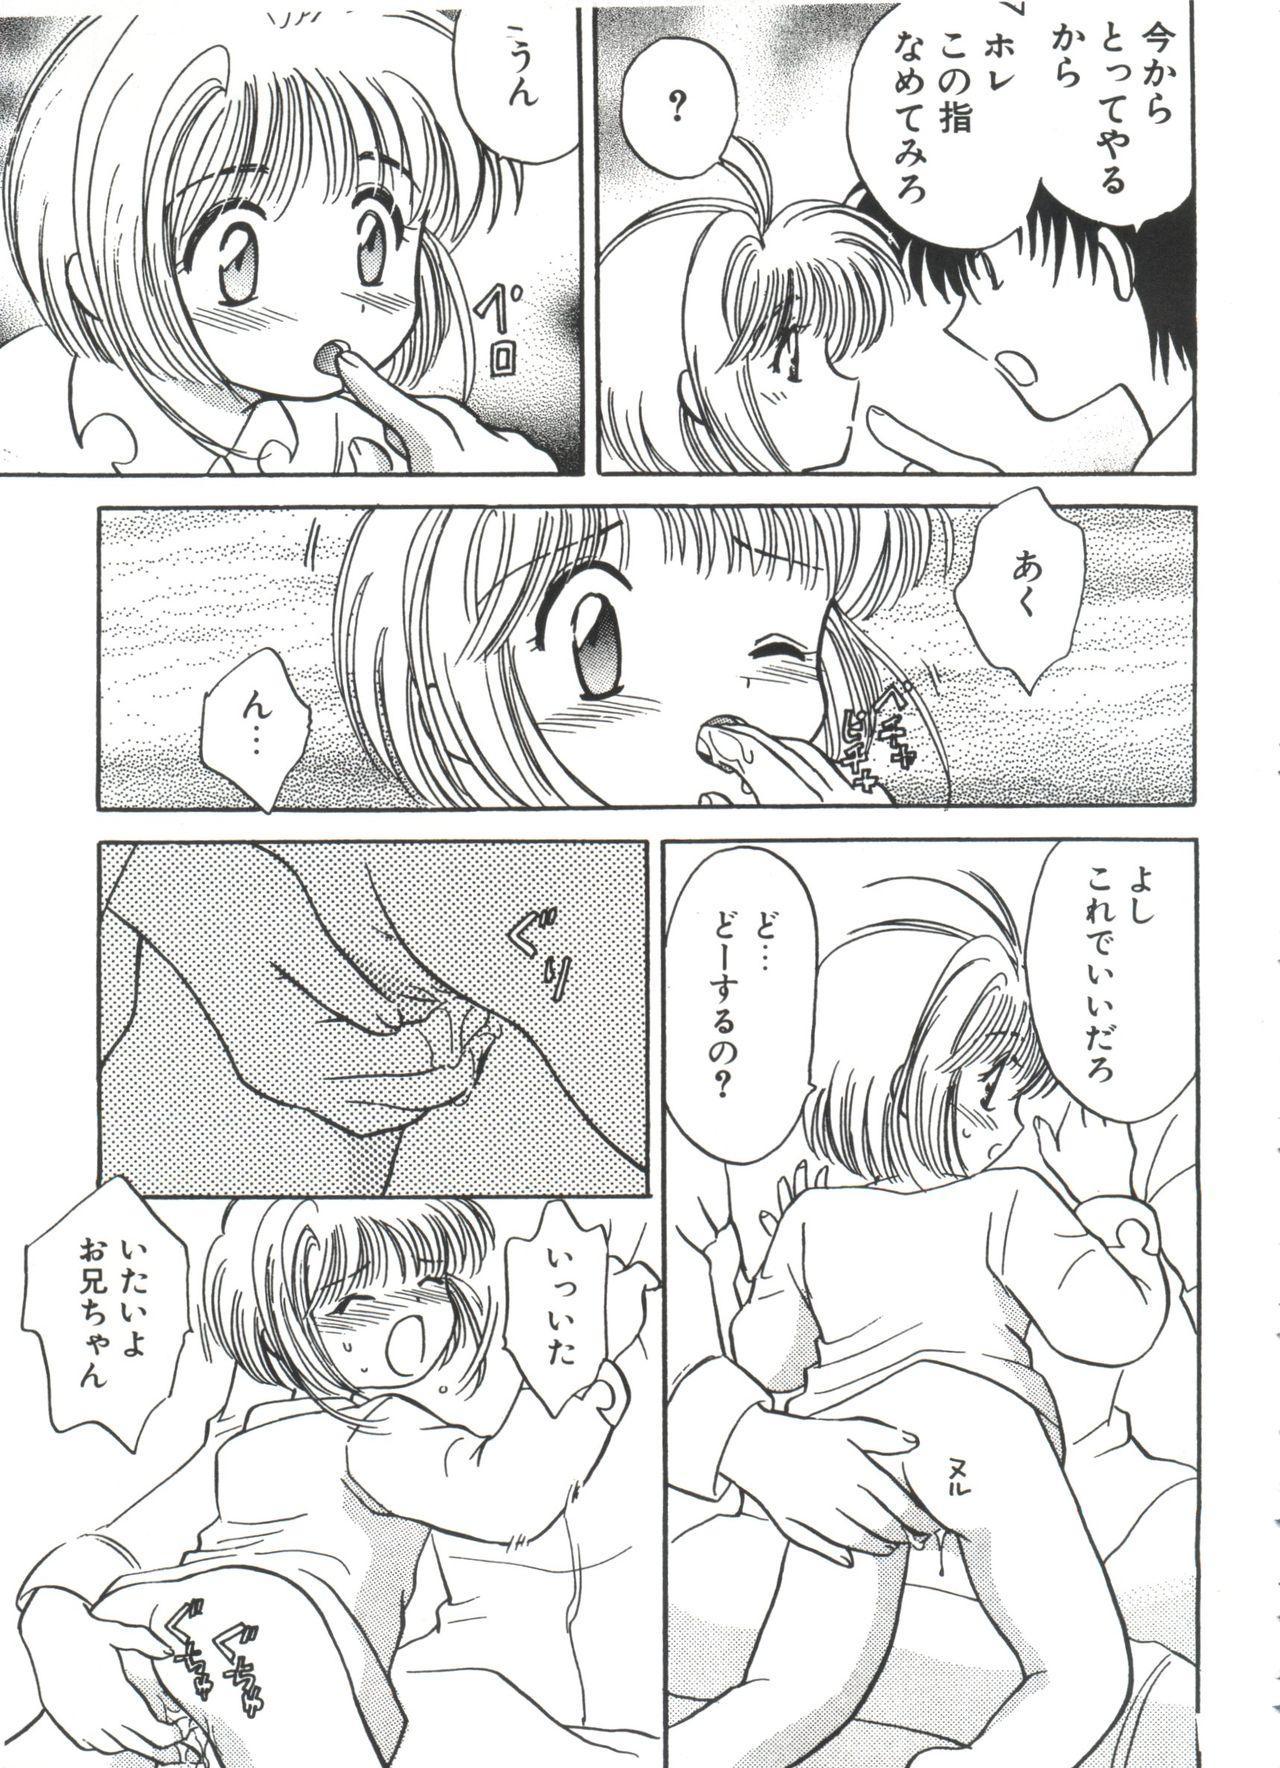 Ero-chan to Issho 2 26